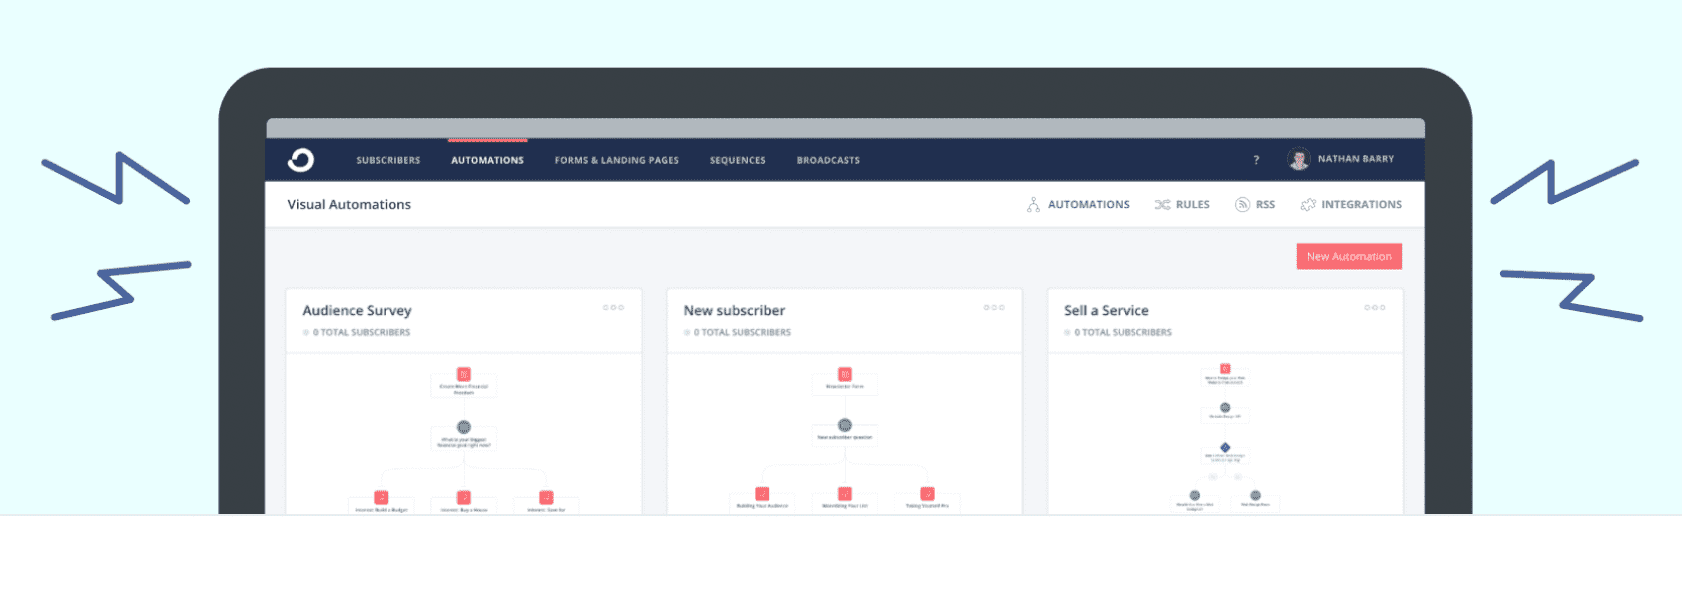 ConvertKit's landing page templates